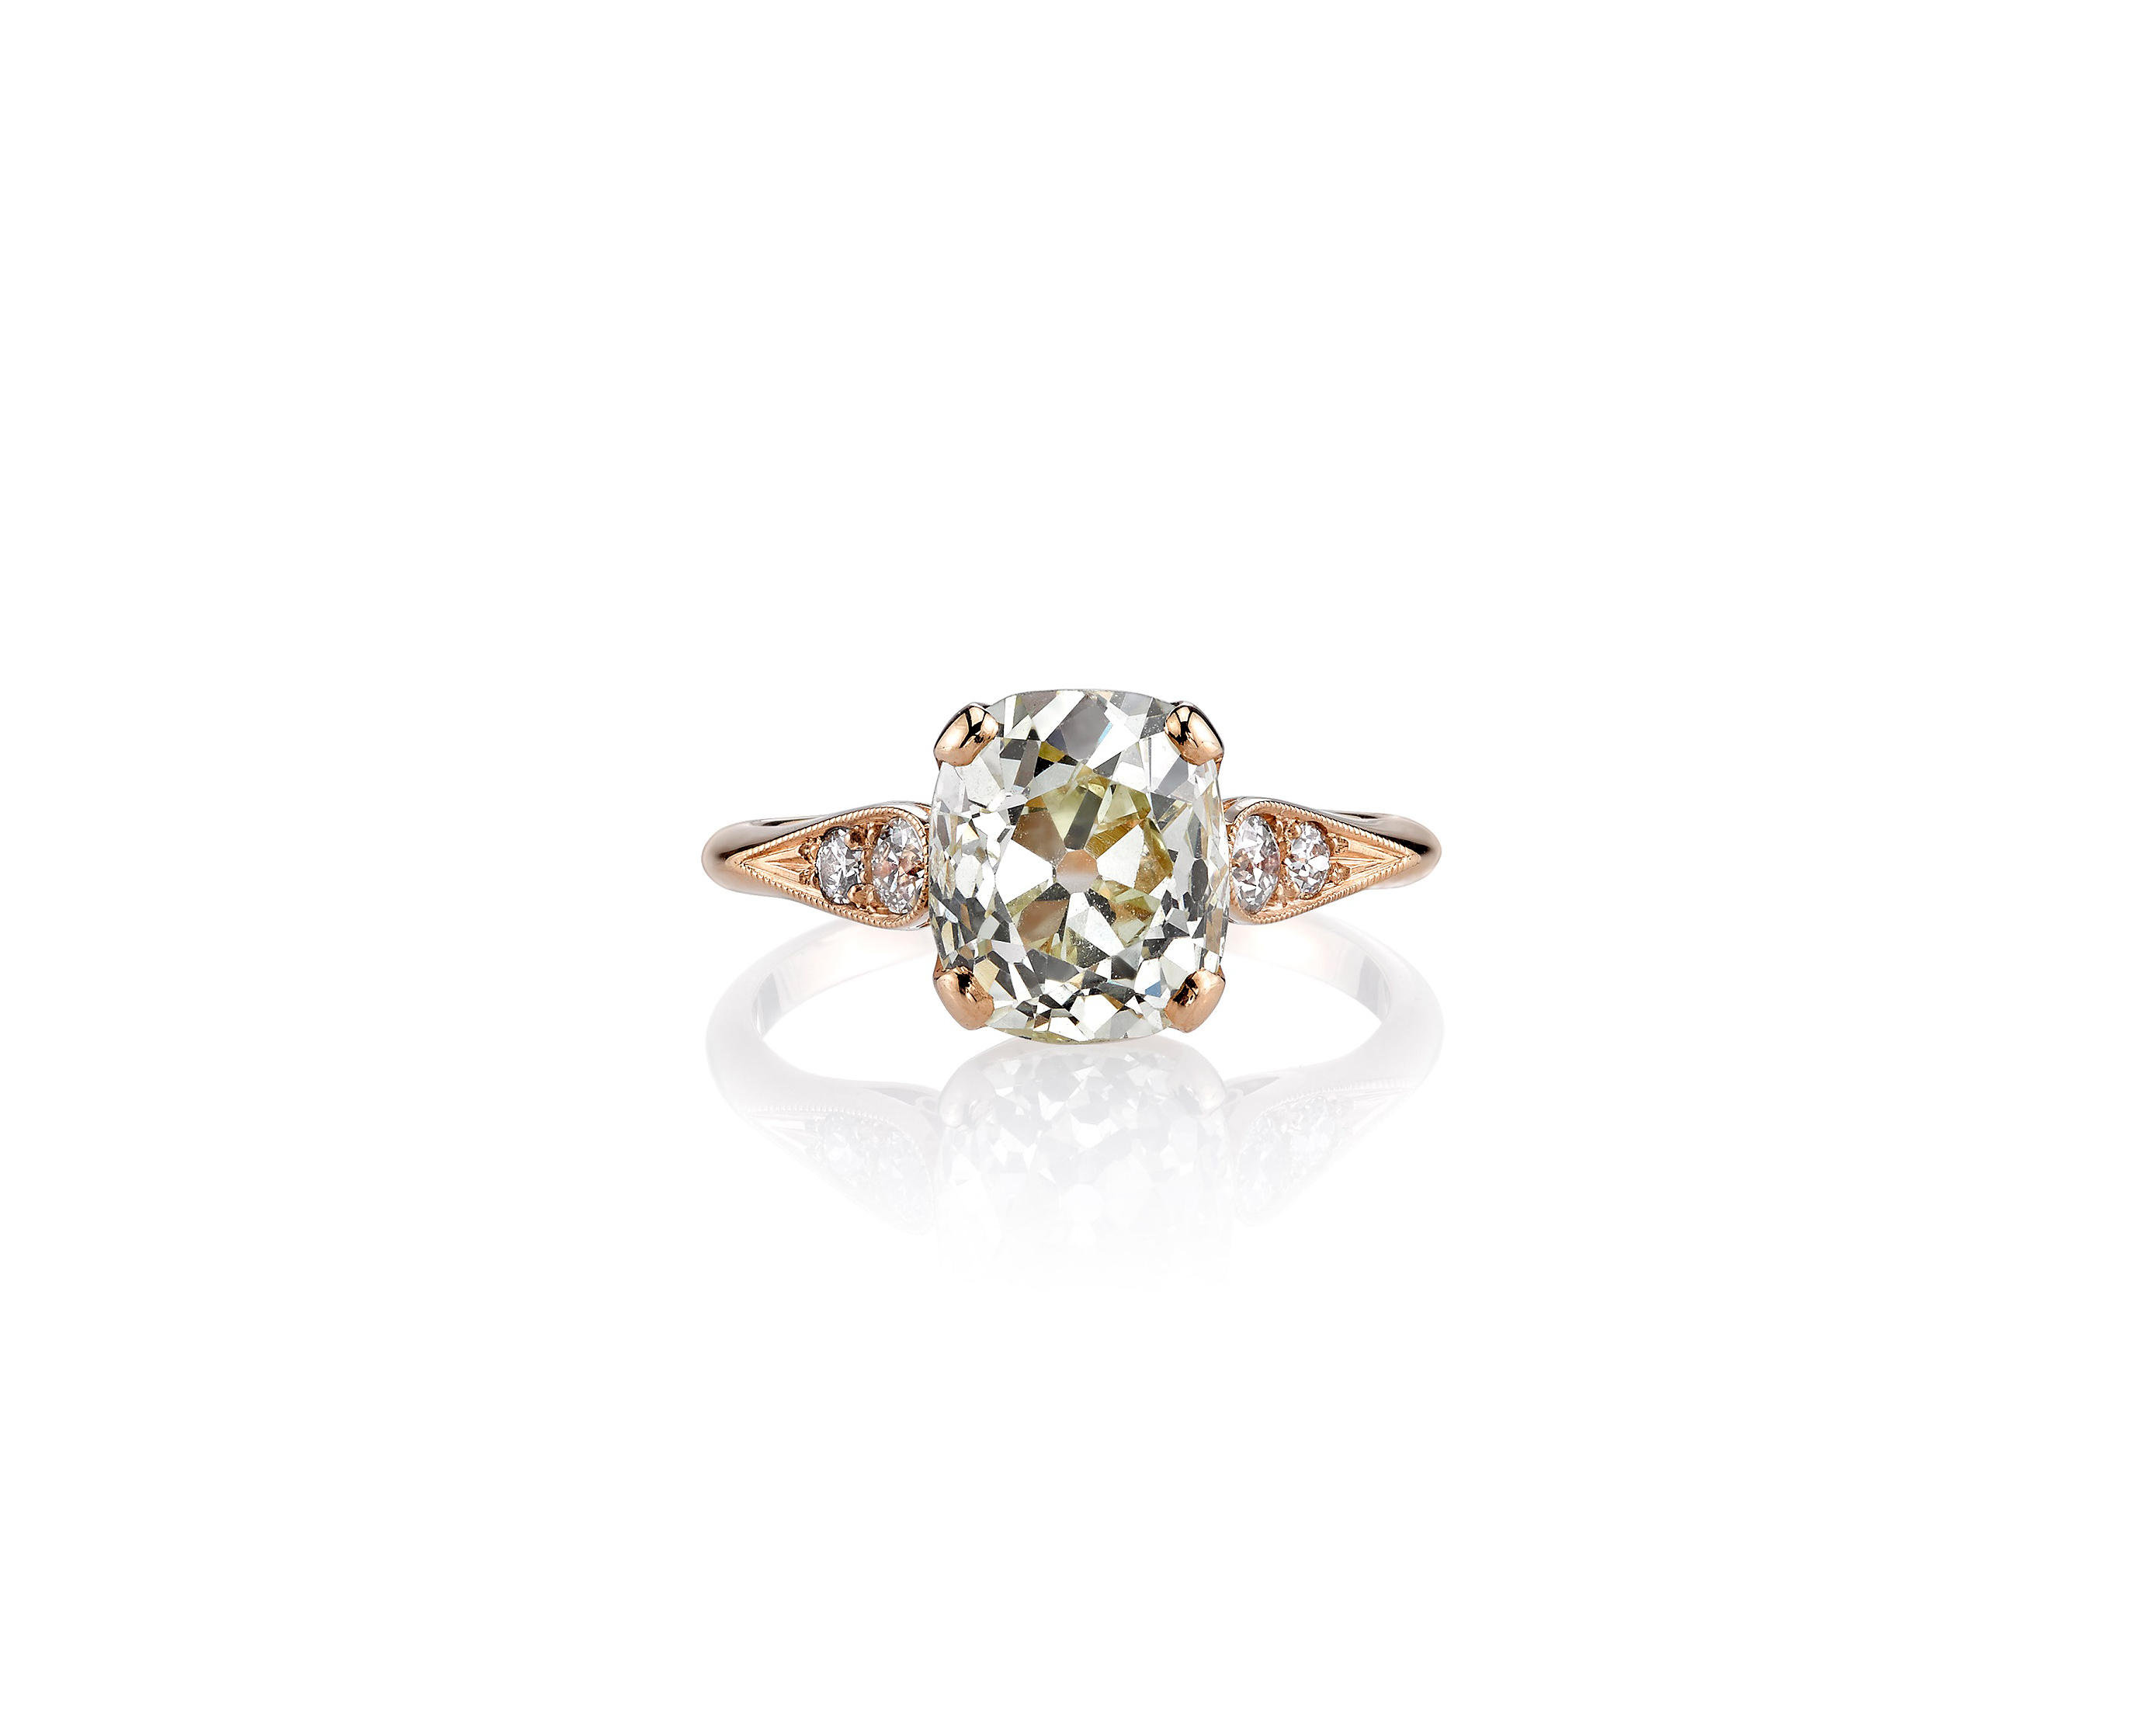 single stone cushion cut vintage engagement ring rose gold